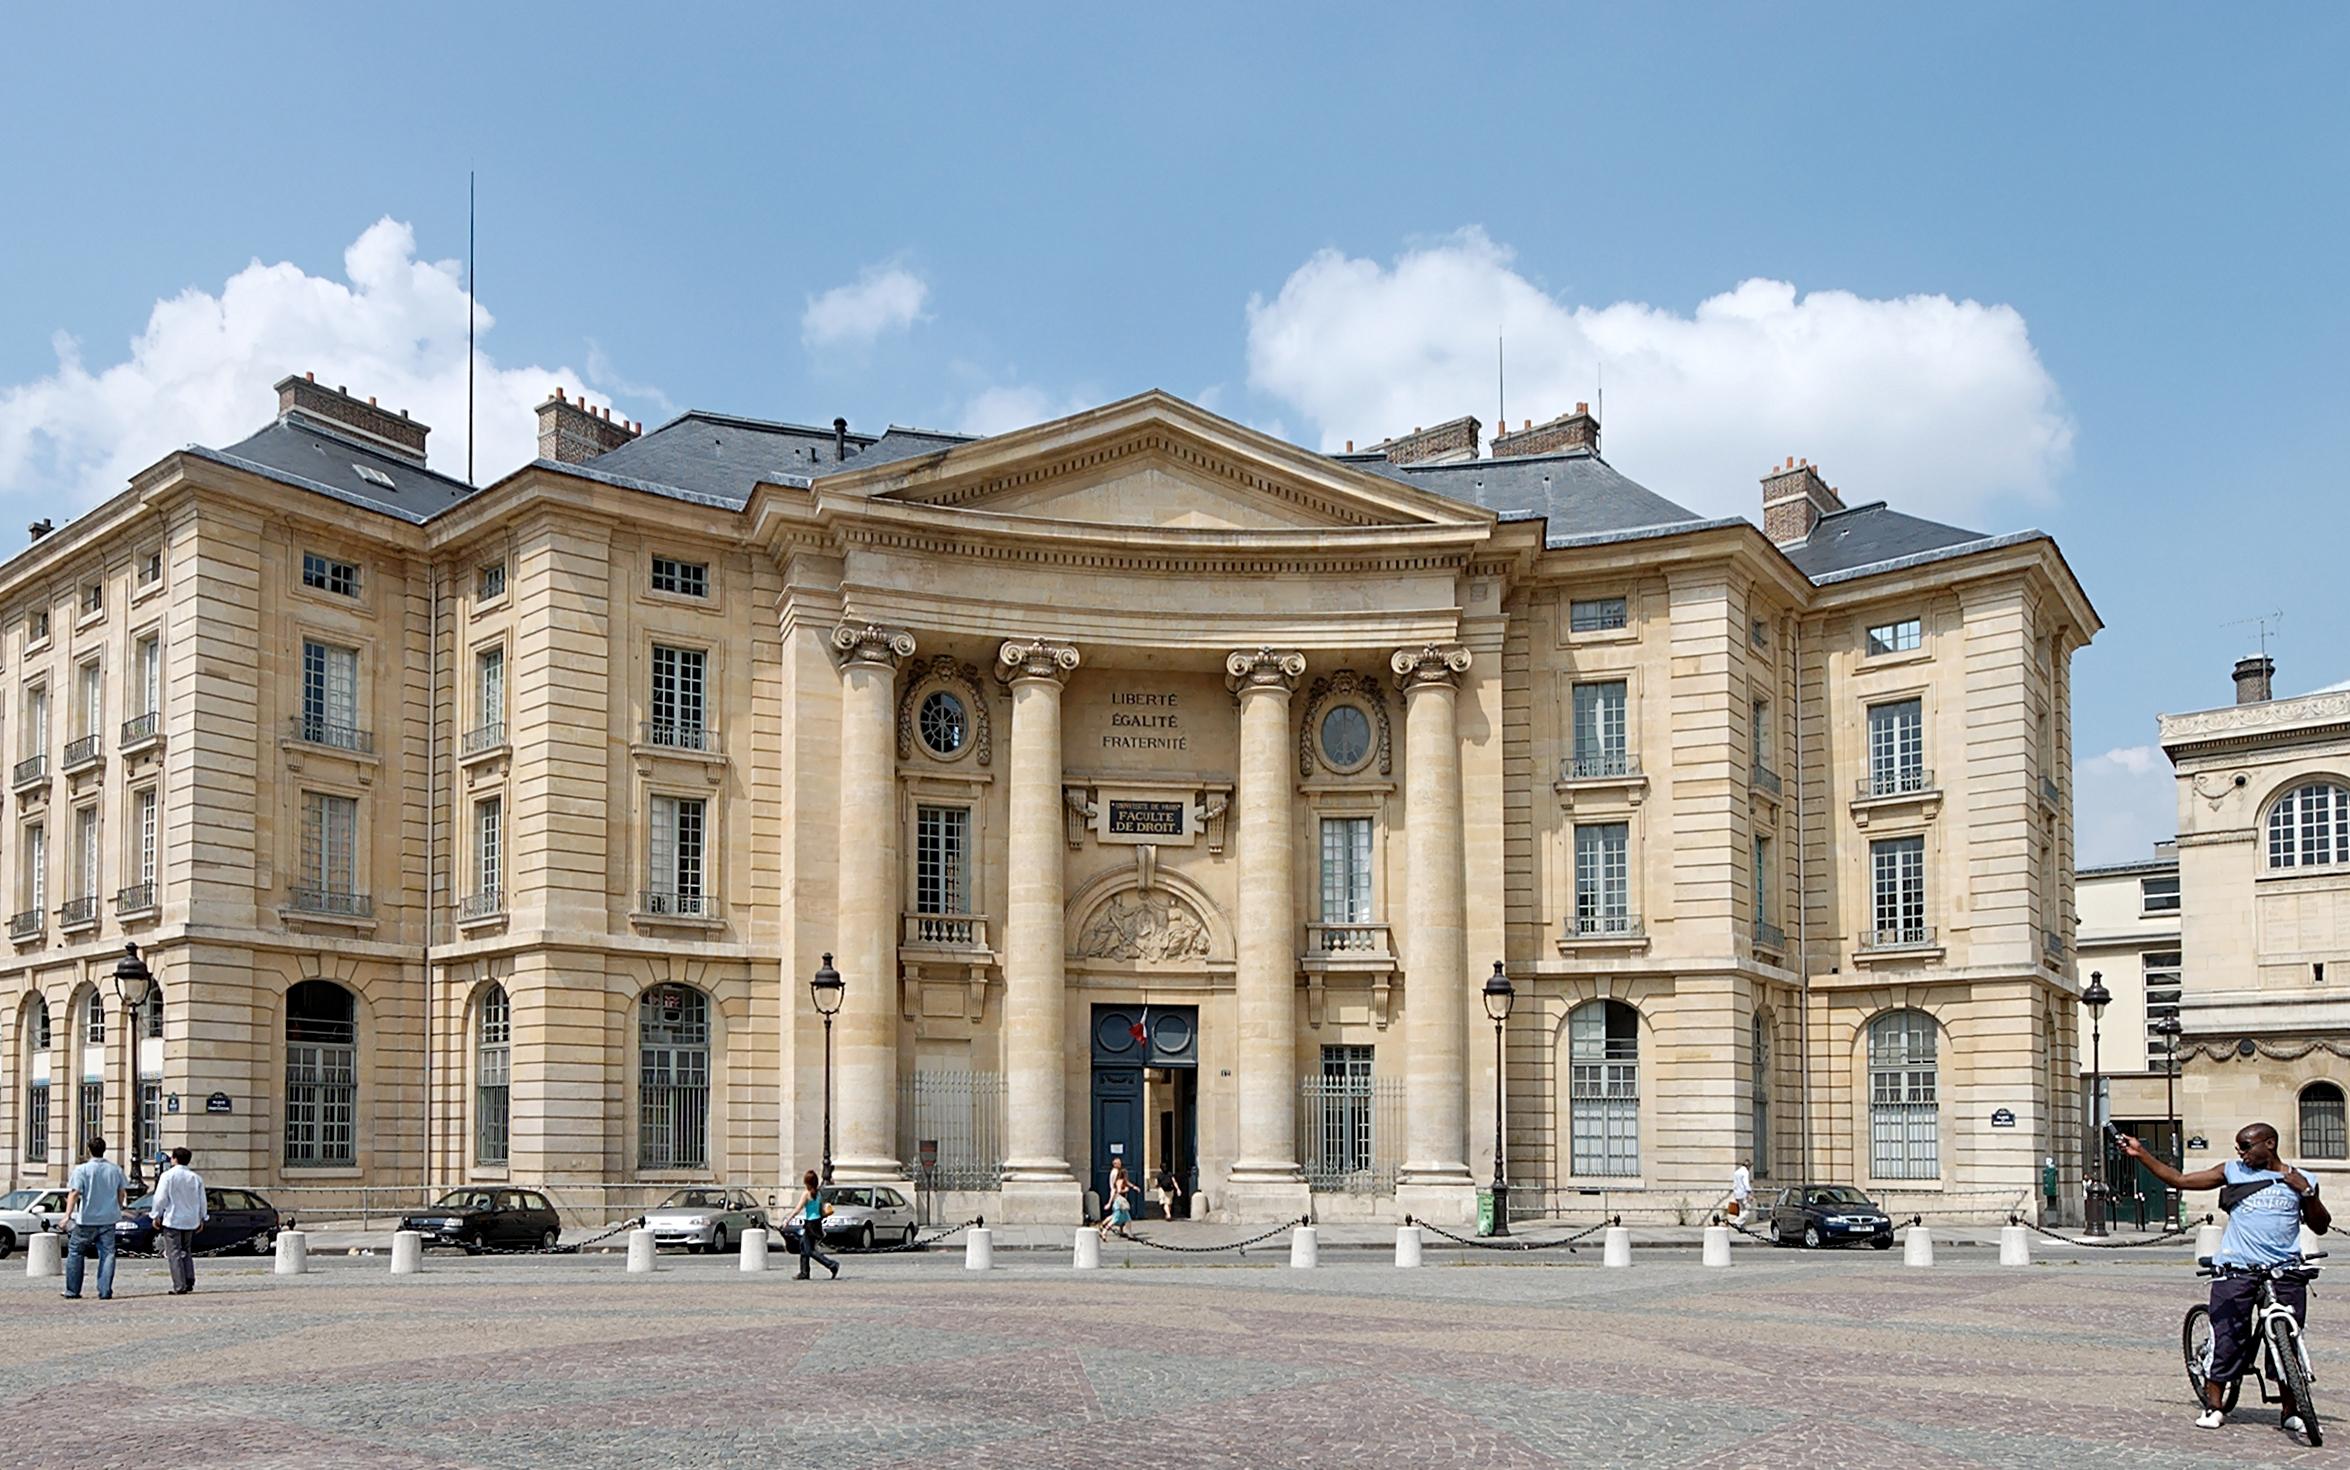 http://fr.academic.ru/pictures/frwiki/85/Universite_Paris_I_Pantheon-Sorbonne.jpg